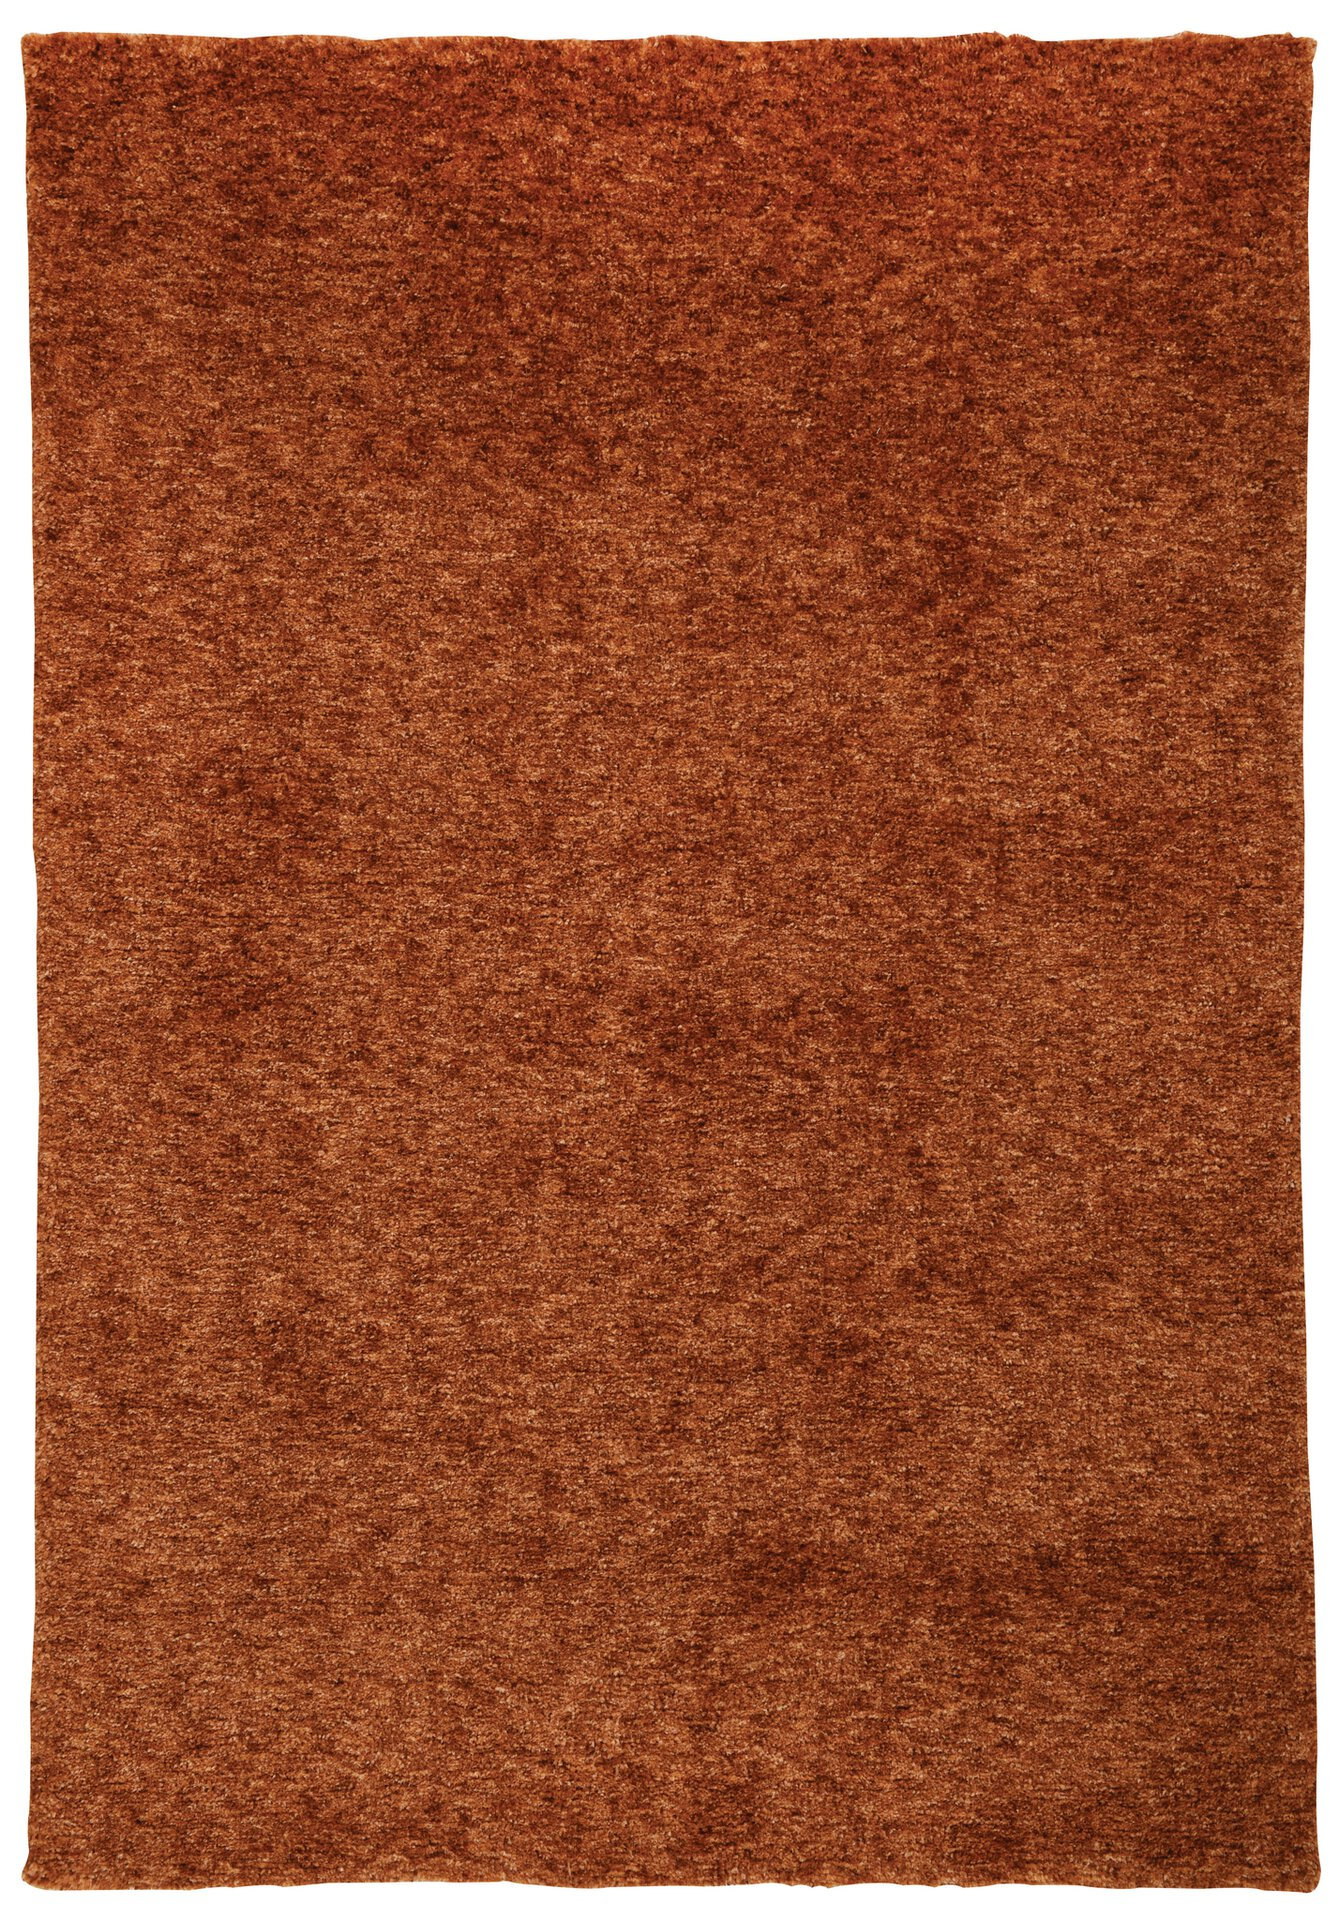 Handtuftteppich Roberto Gino Falcone Textil orange 160 x 230 cm